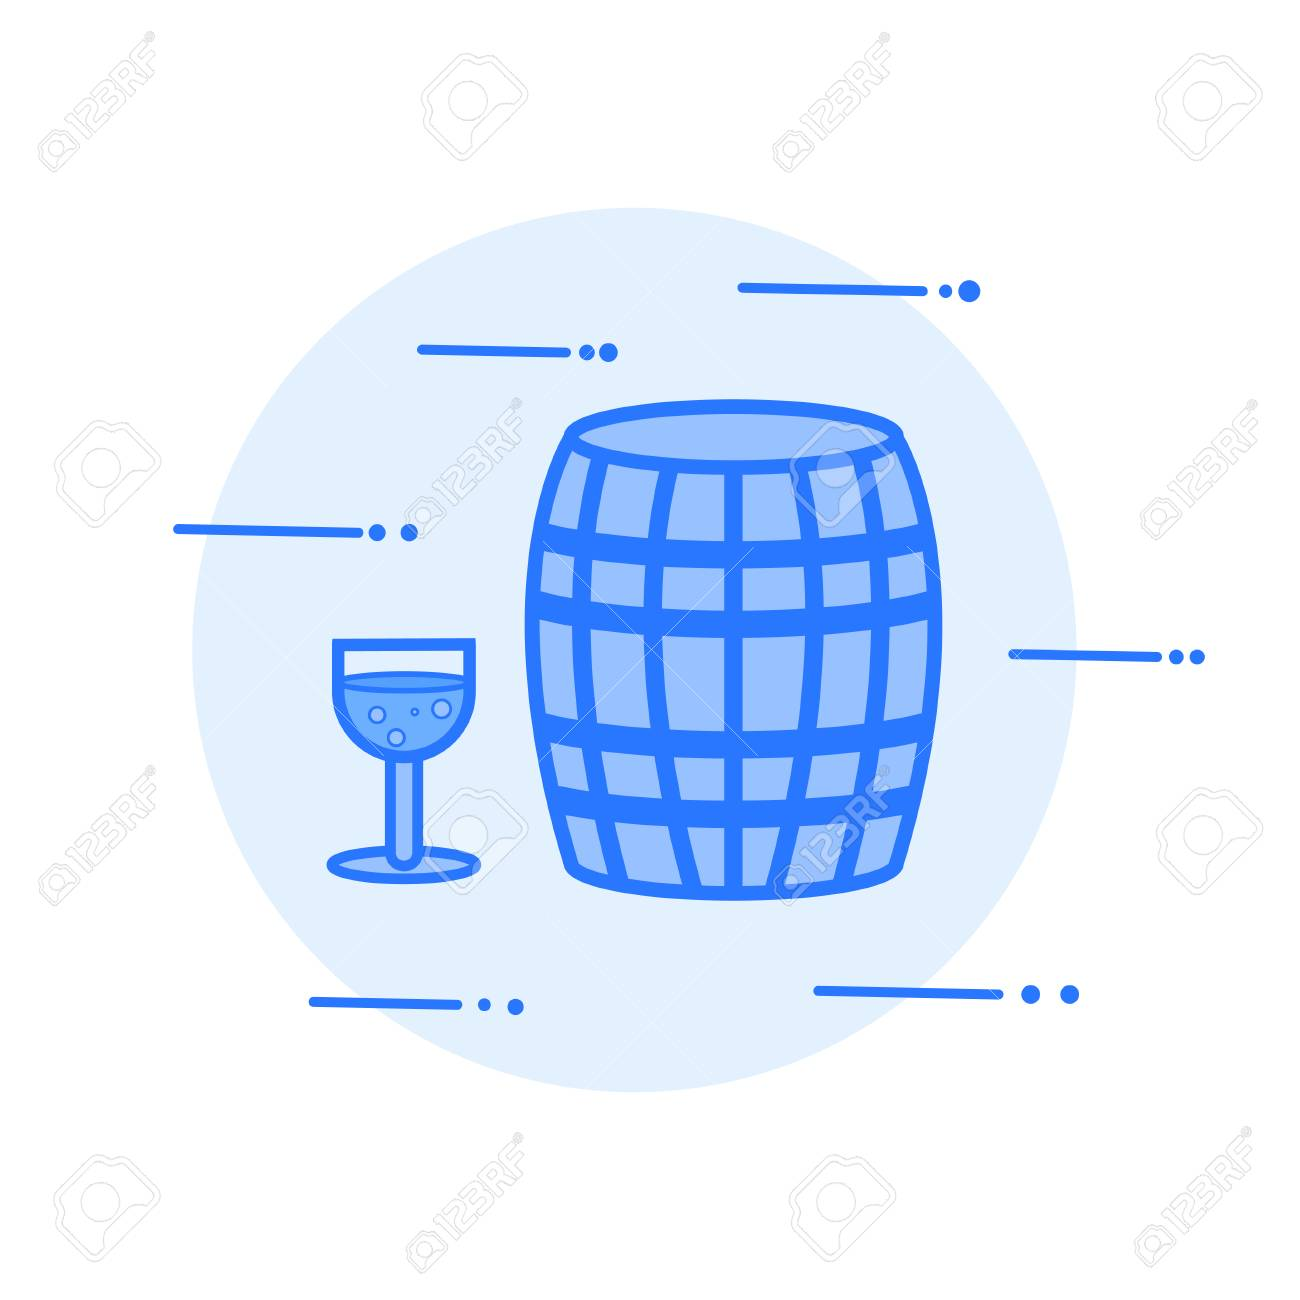 wine barrel and glass vector illustration icon. - 80901080